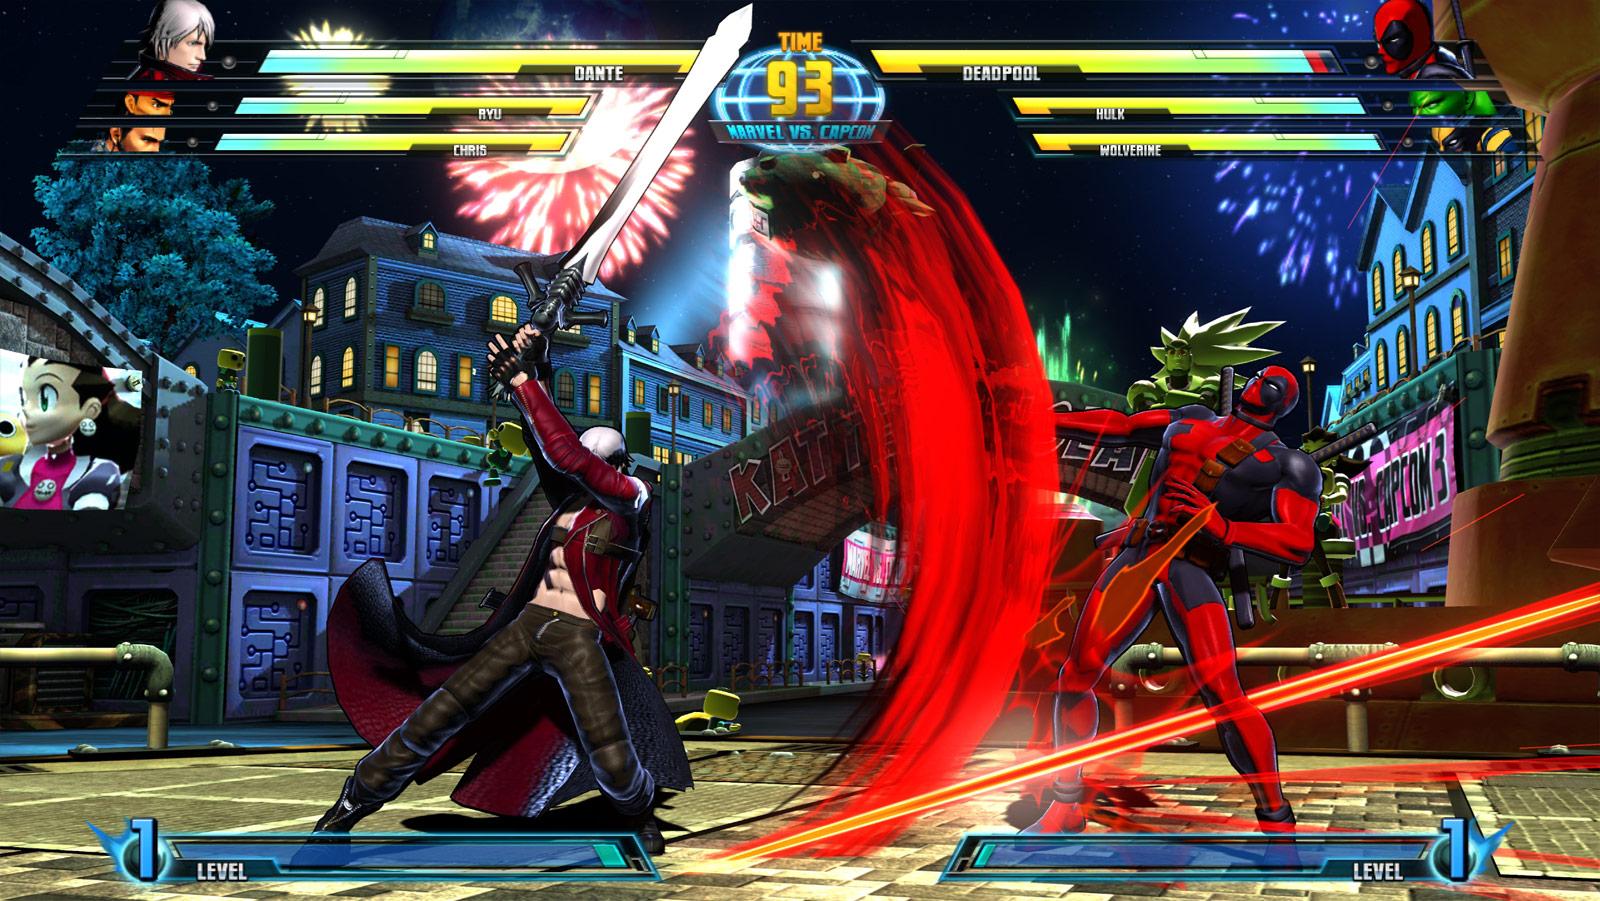 Marvel vs. Capcom 3 screen shot from E3 image #10